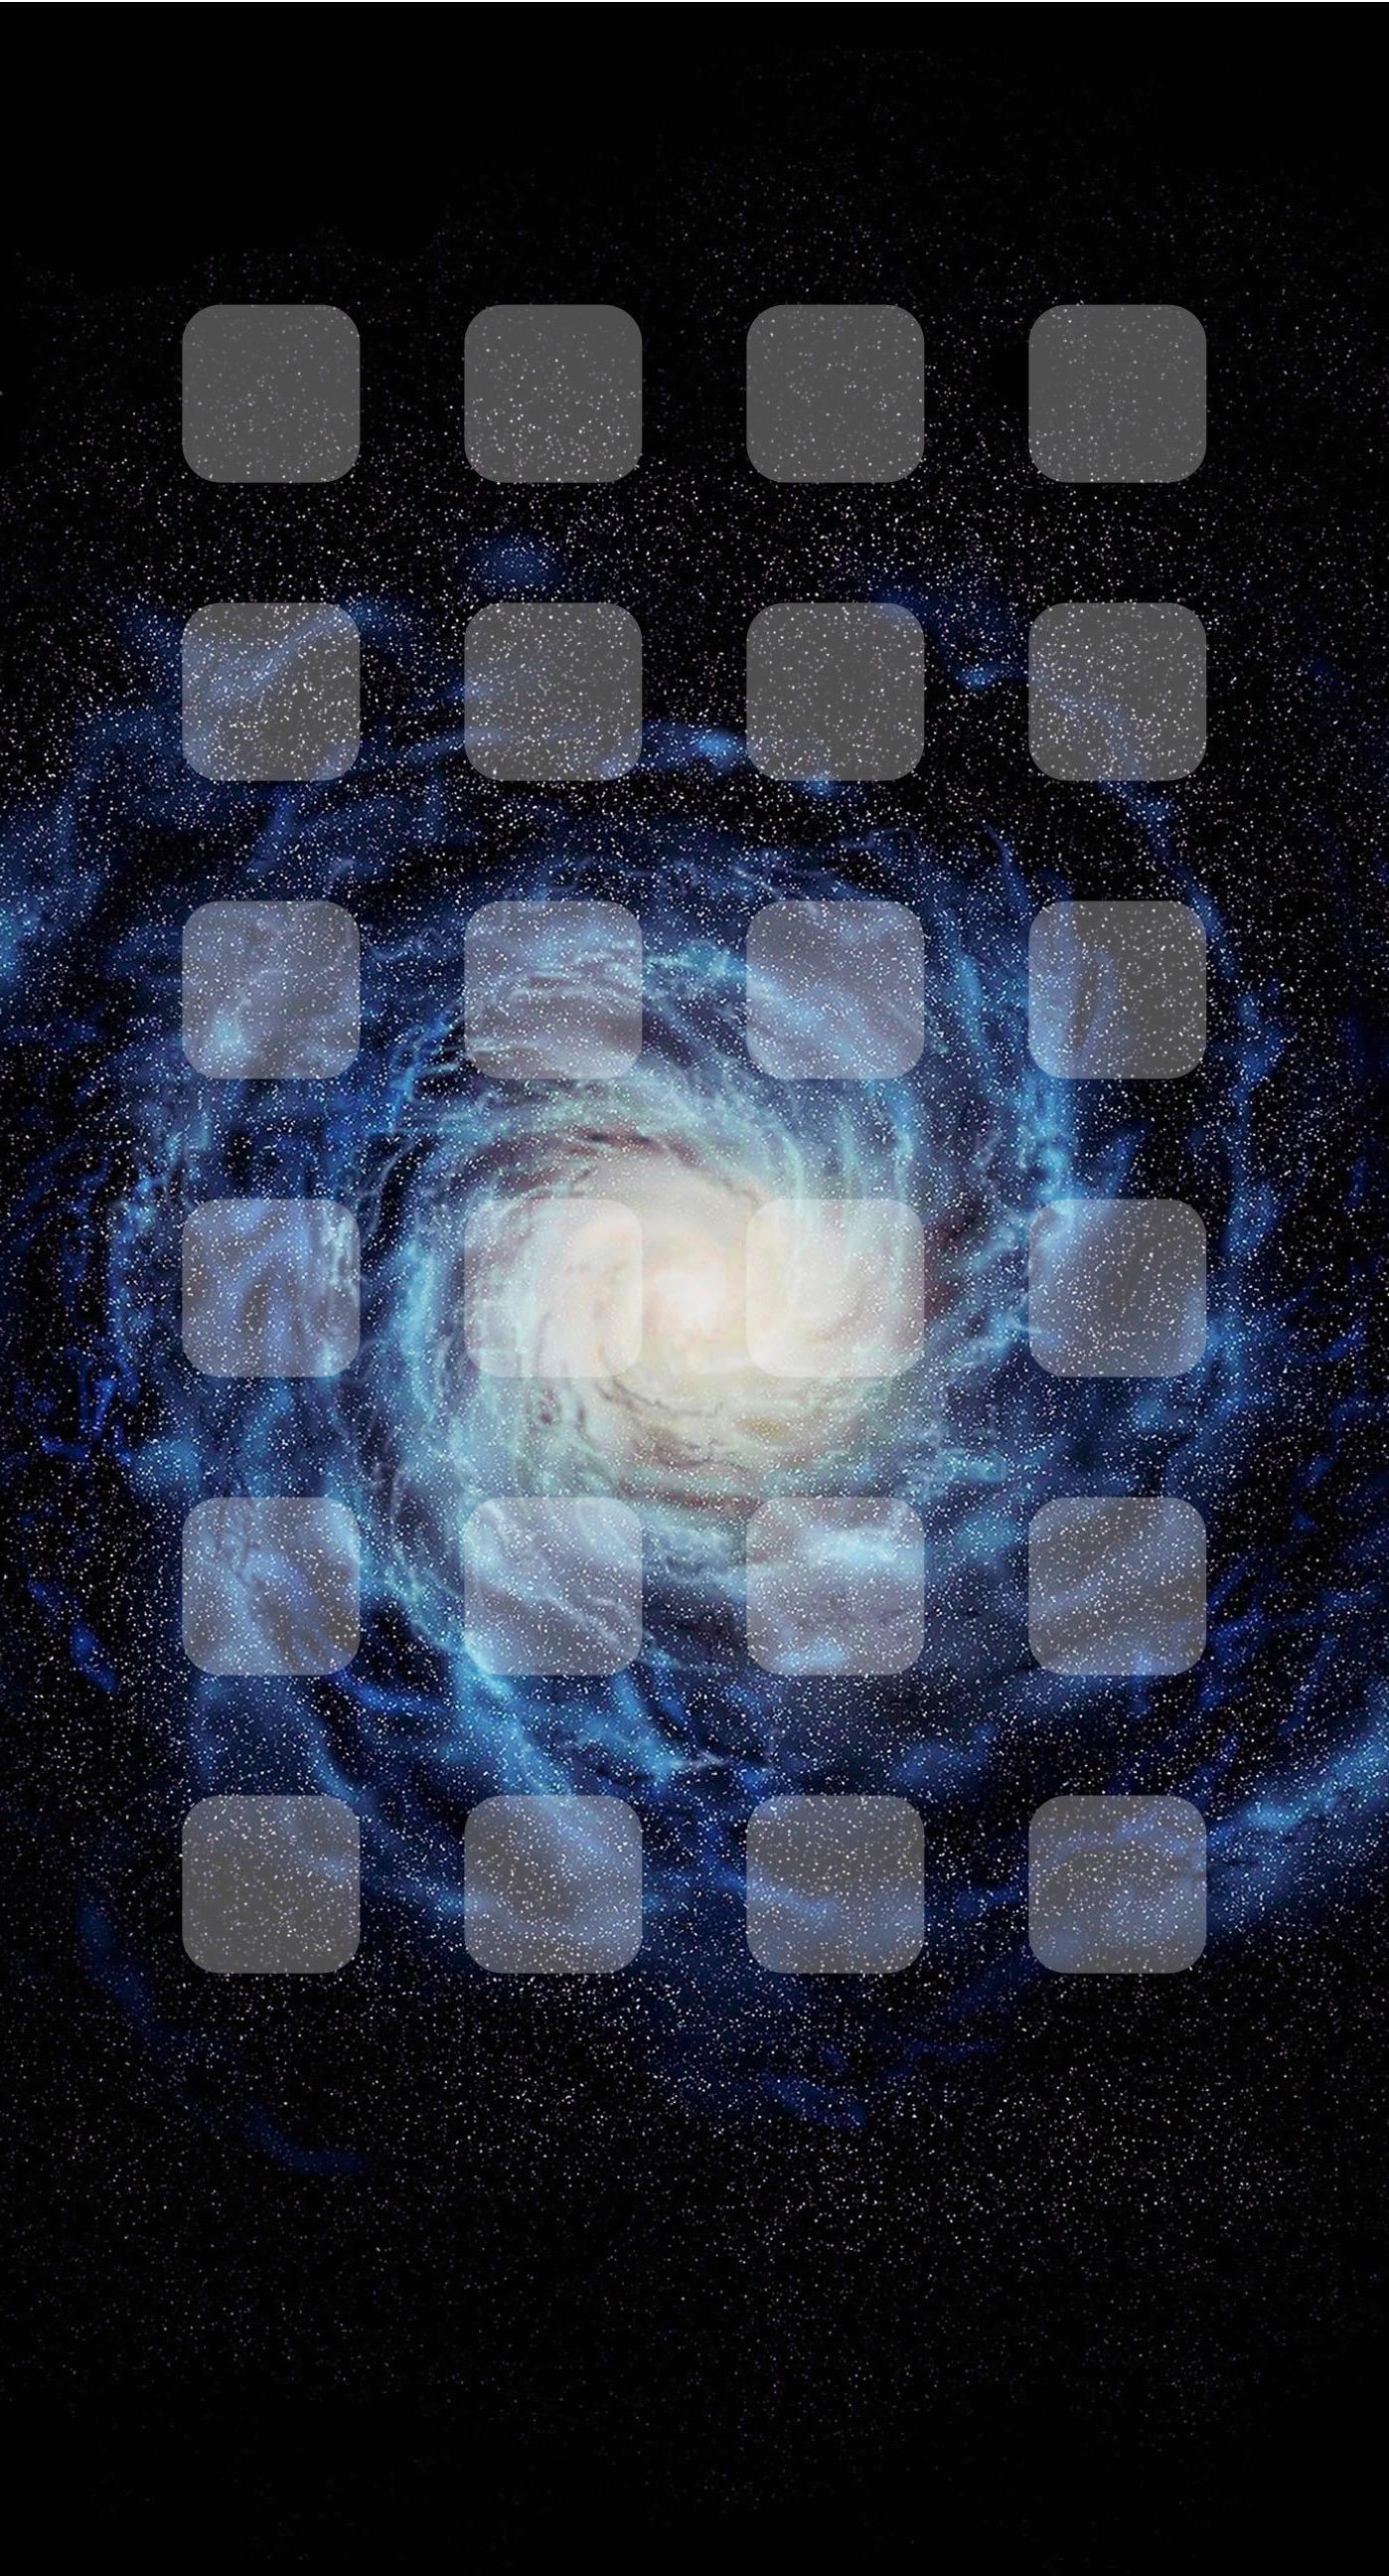 Space Galaxy Black Shelf Wallpaper Sc Iphone8plus